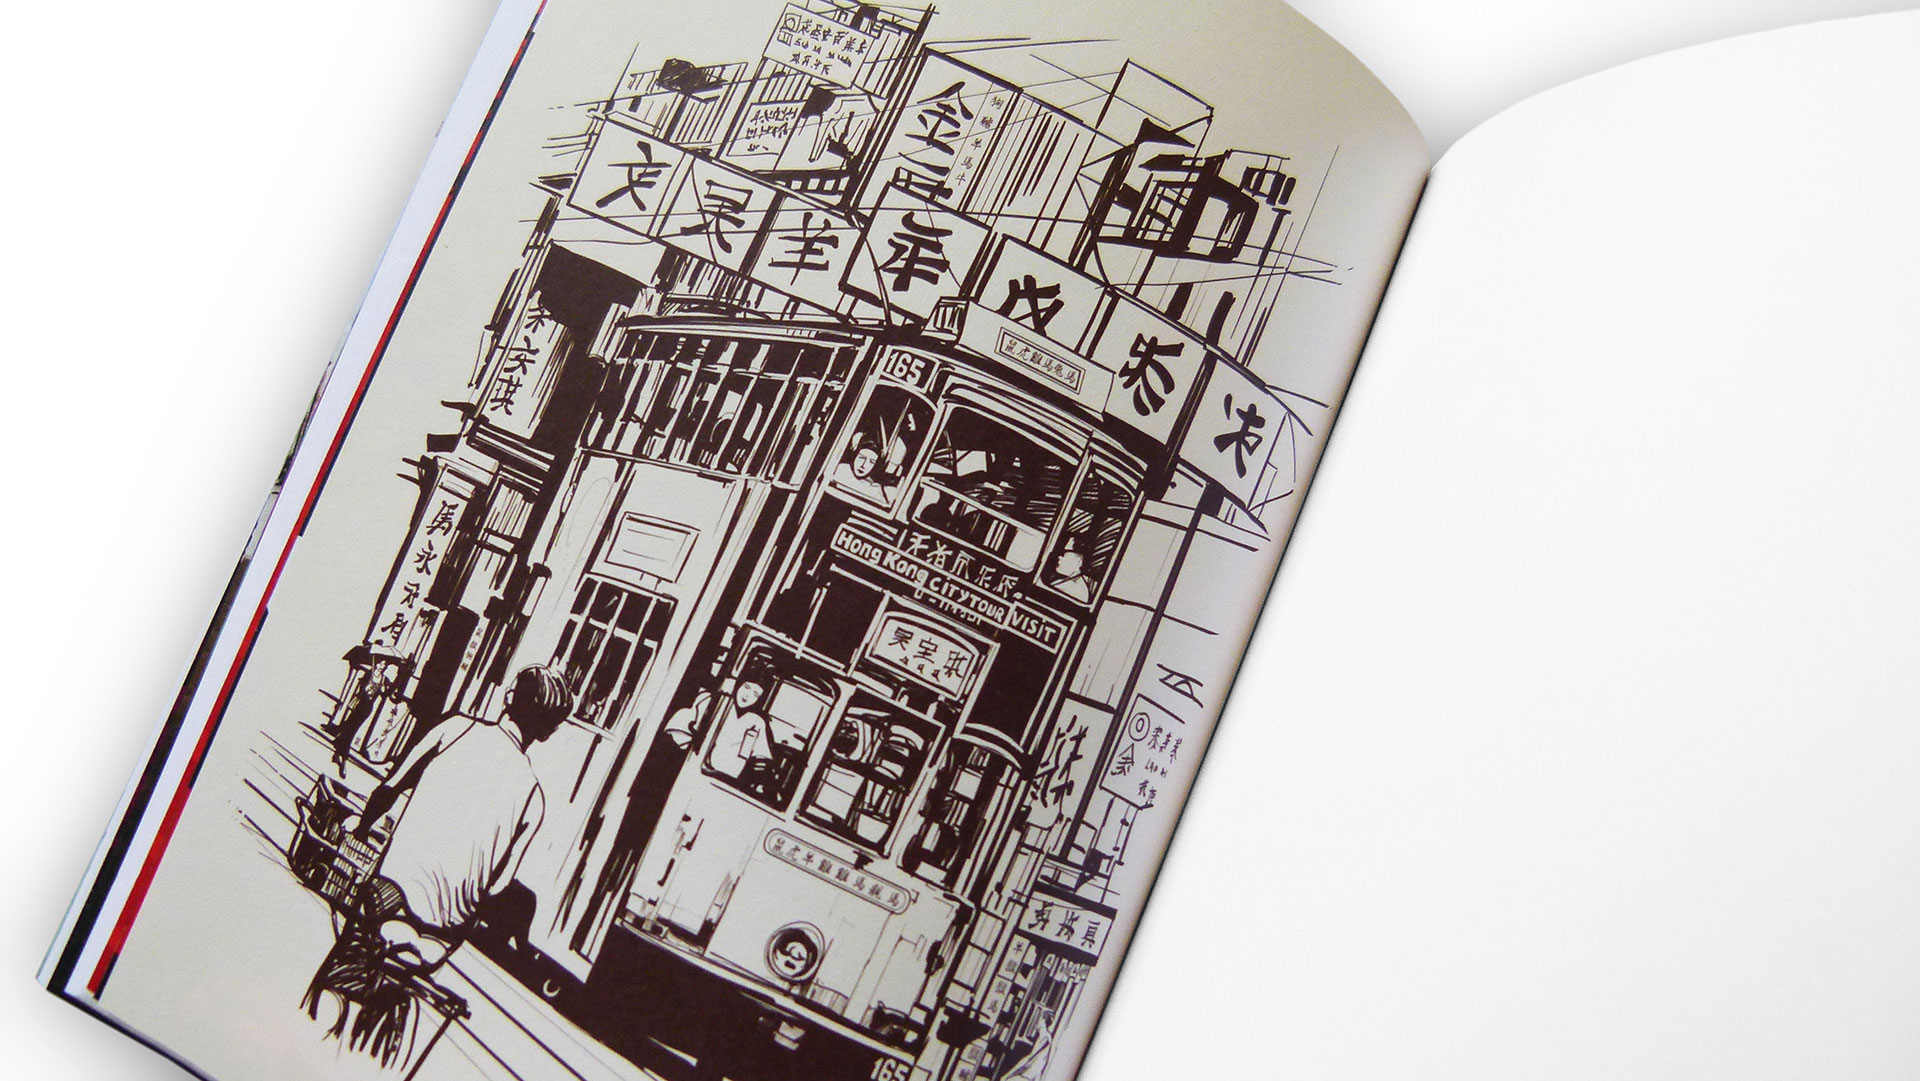 shutterstock-premier-journal-5